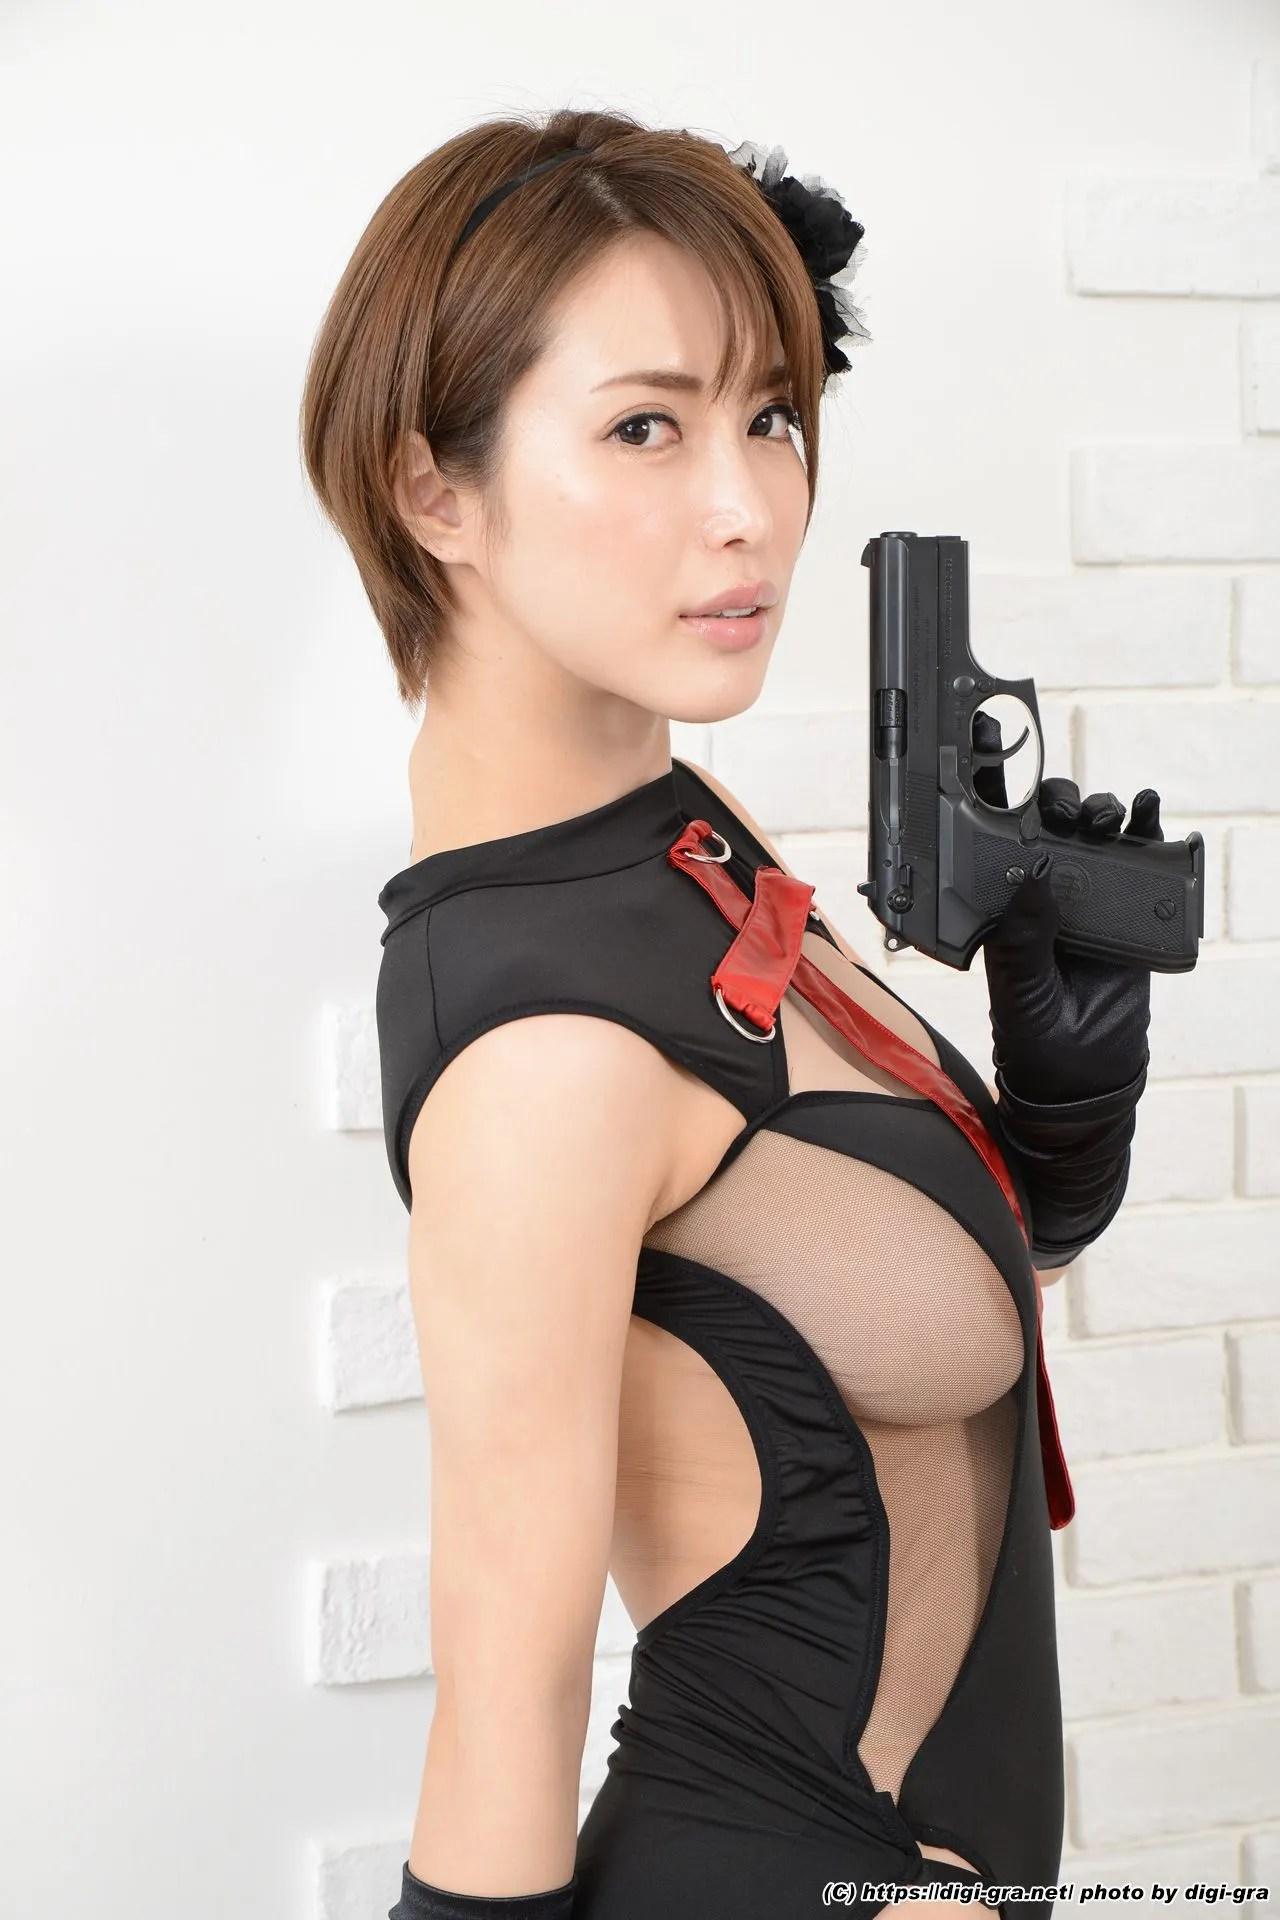 [Digi-Gra] 君岛みお Mio Kimishima Photoset 05 写真集[62P]插图(11)